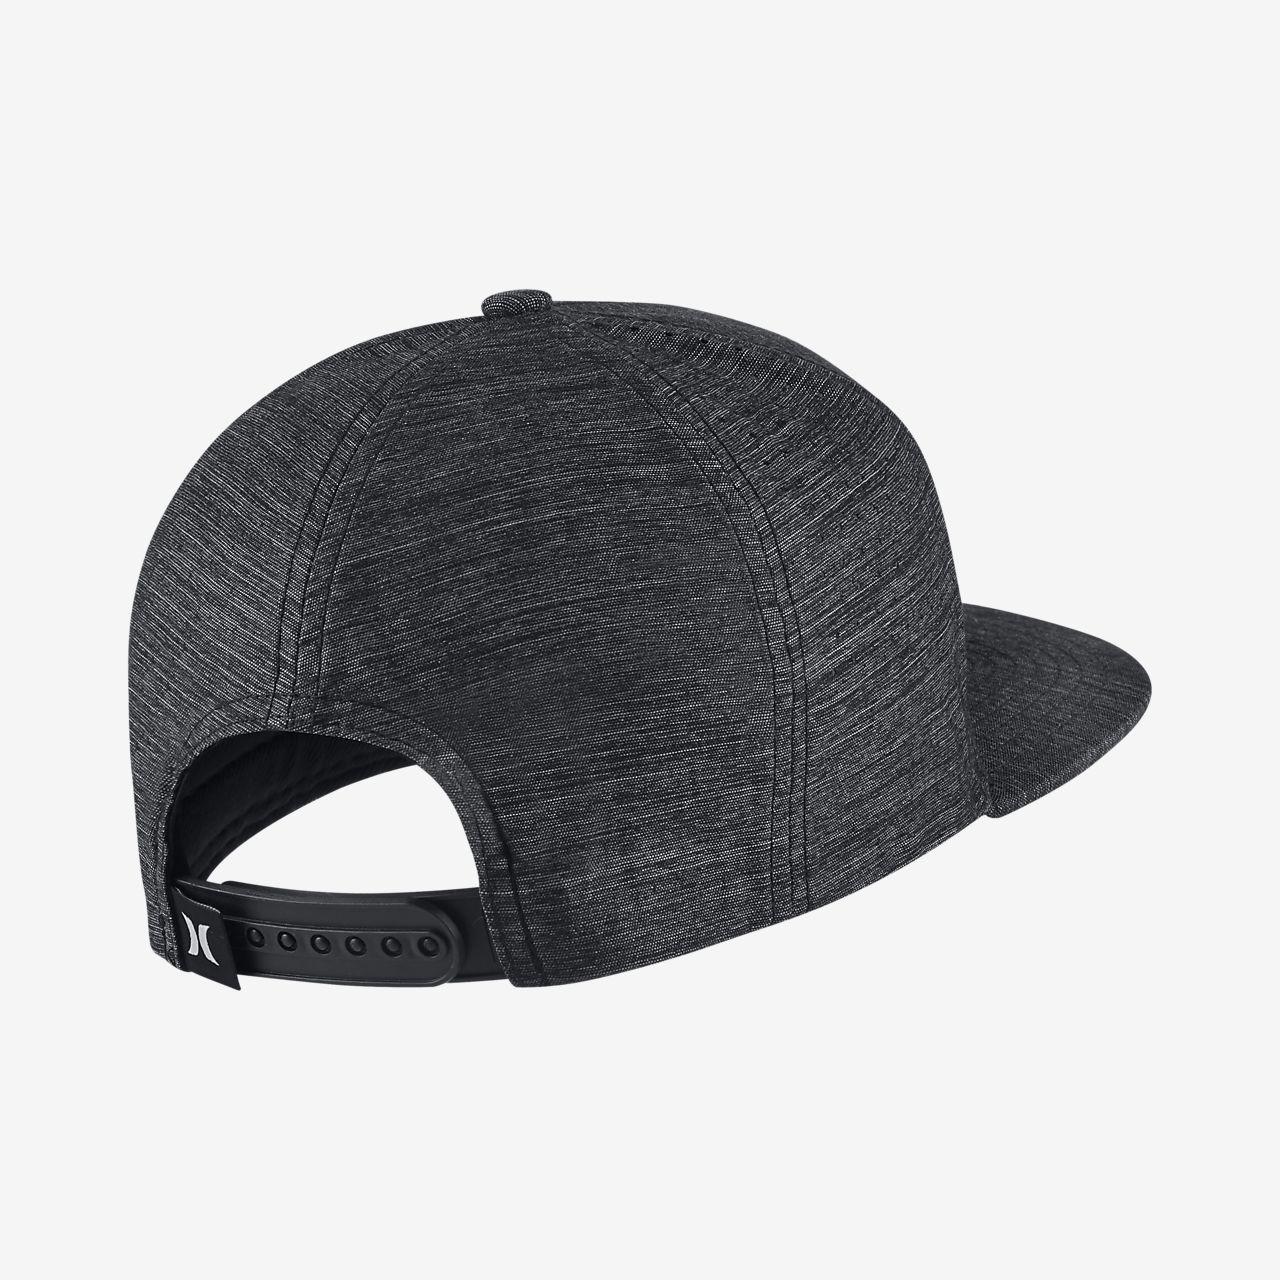 887cde48a29f9 Hurley Icon Dri-FIT Unisex Adjustable Hat. Nike.com AE